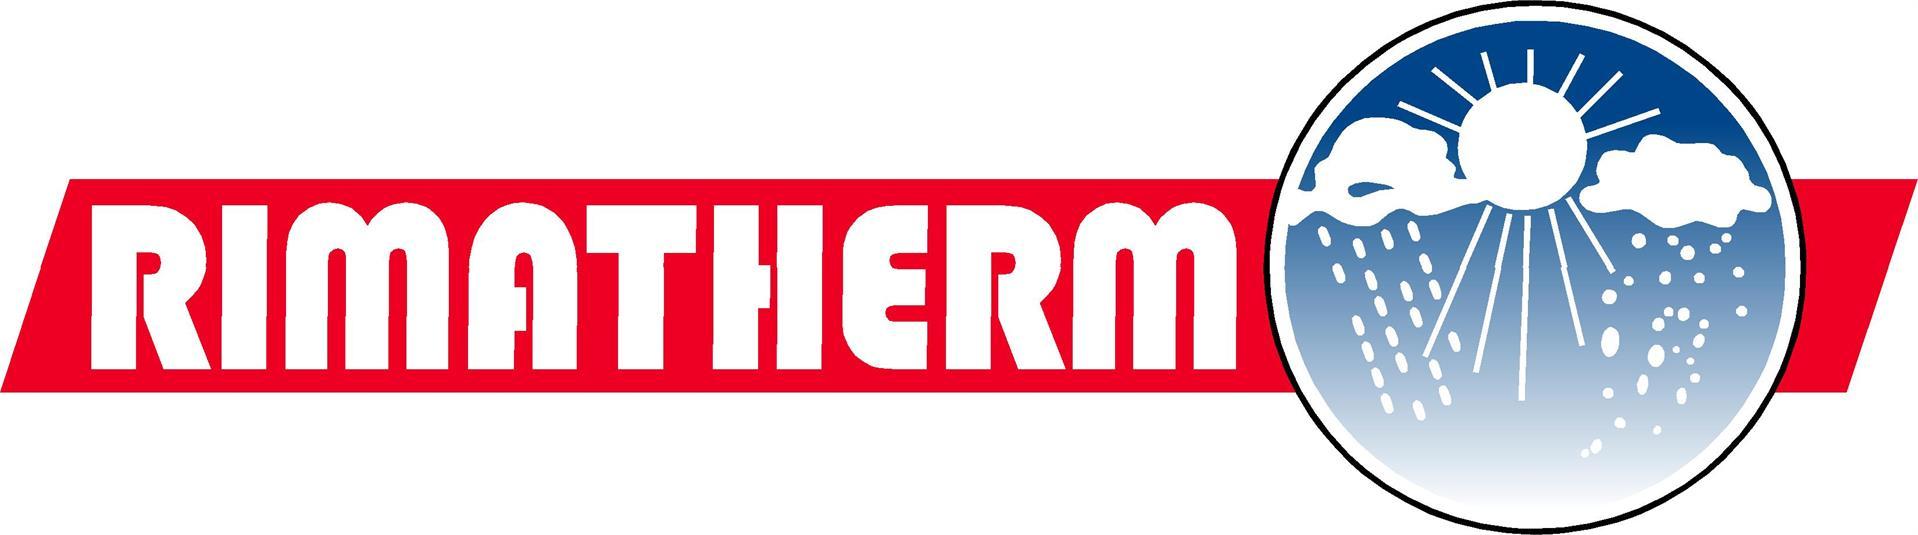 Impianti termosanitari Rimatherm